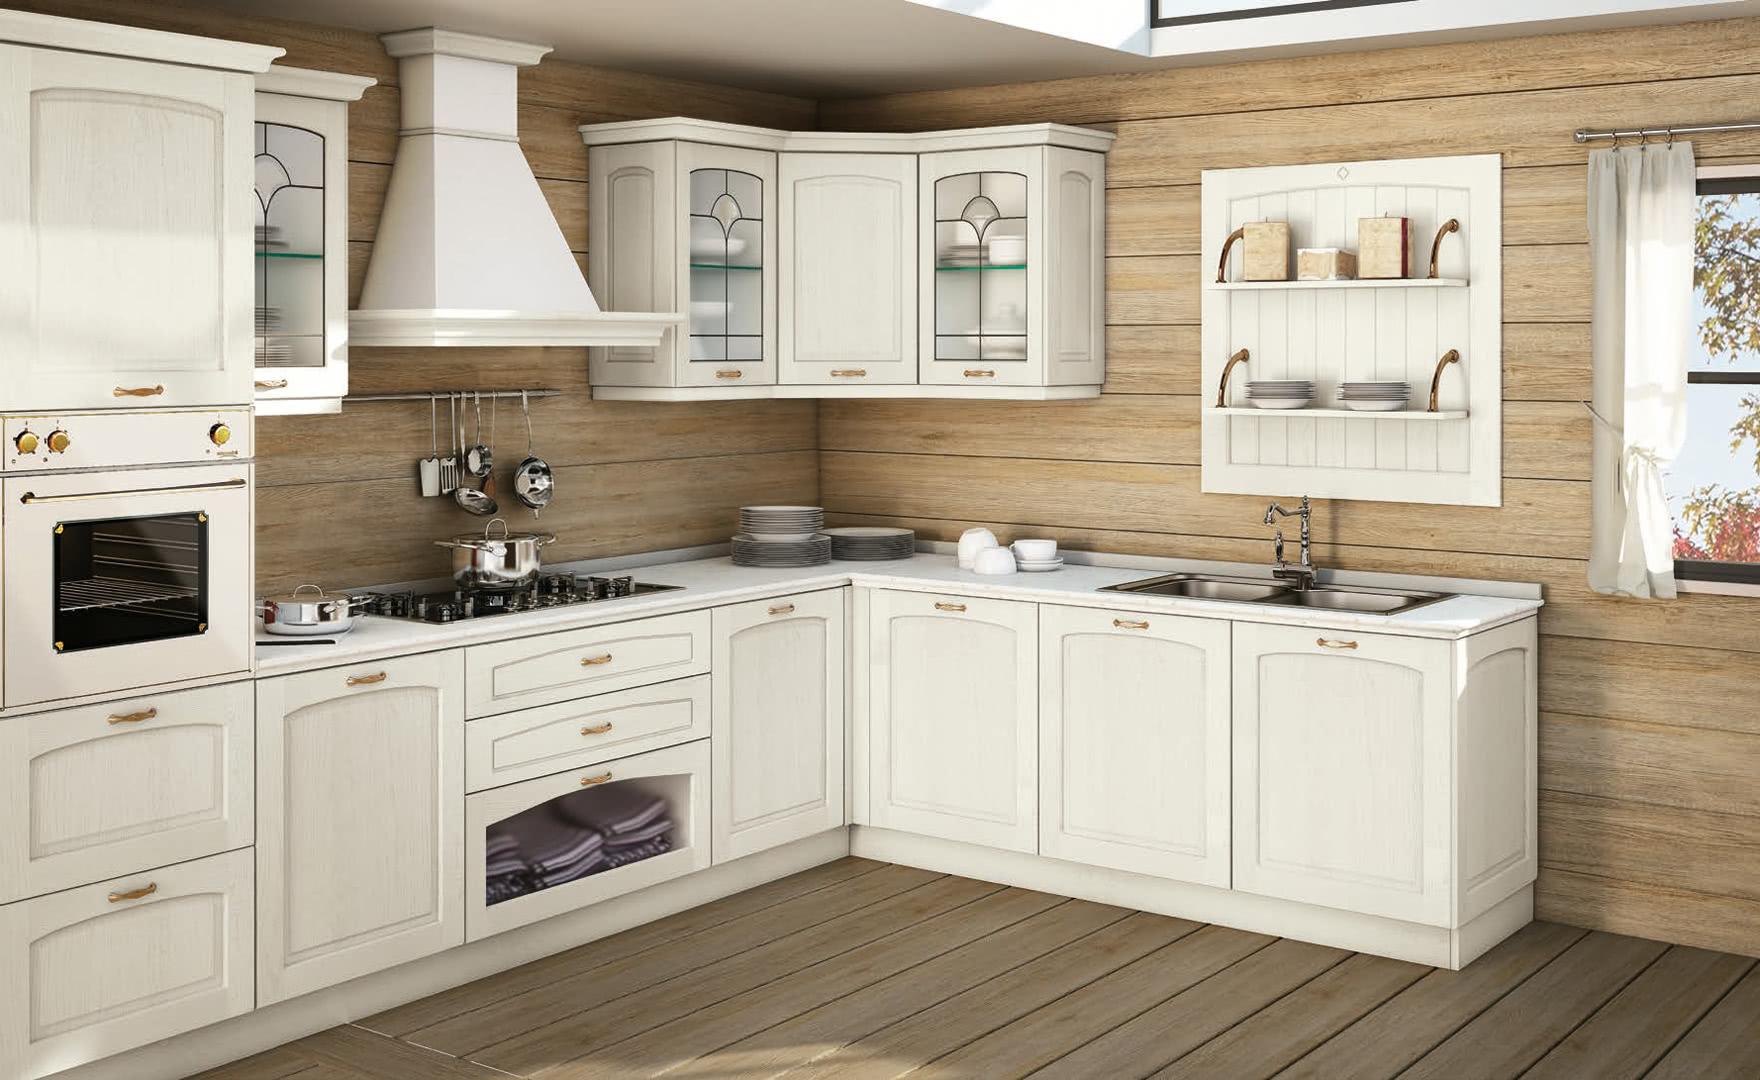 Cucina Classica Lube - Malin Creo Kitchens